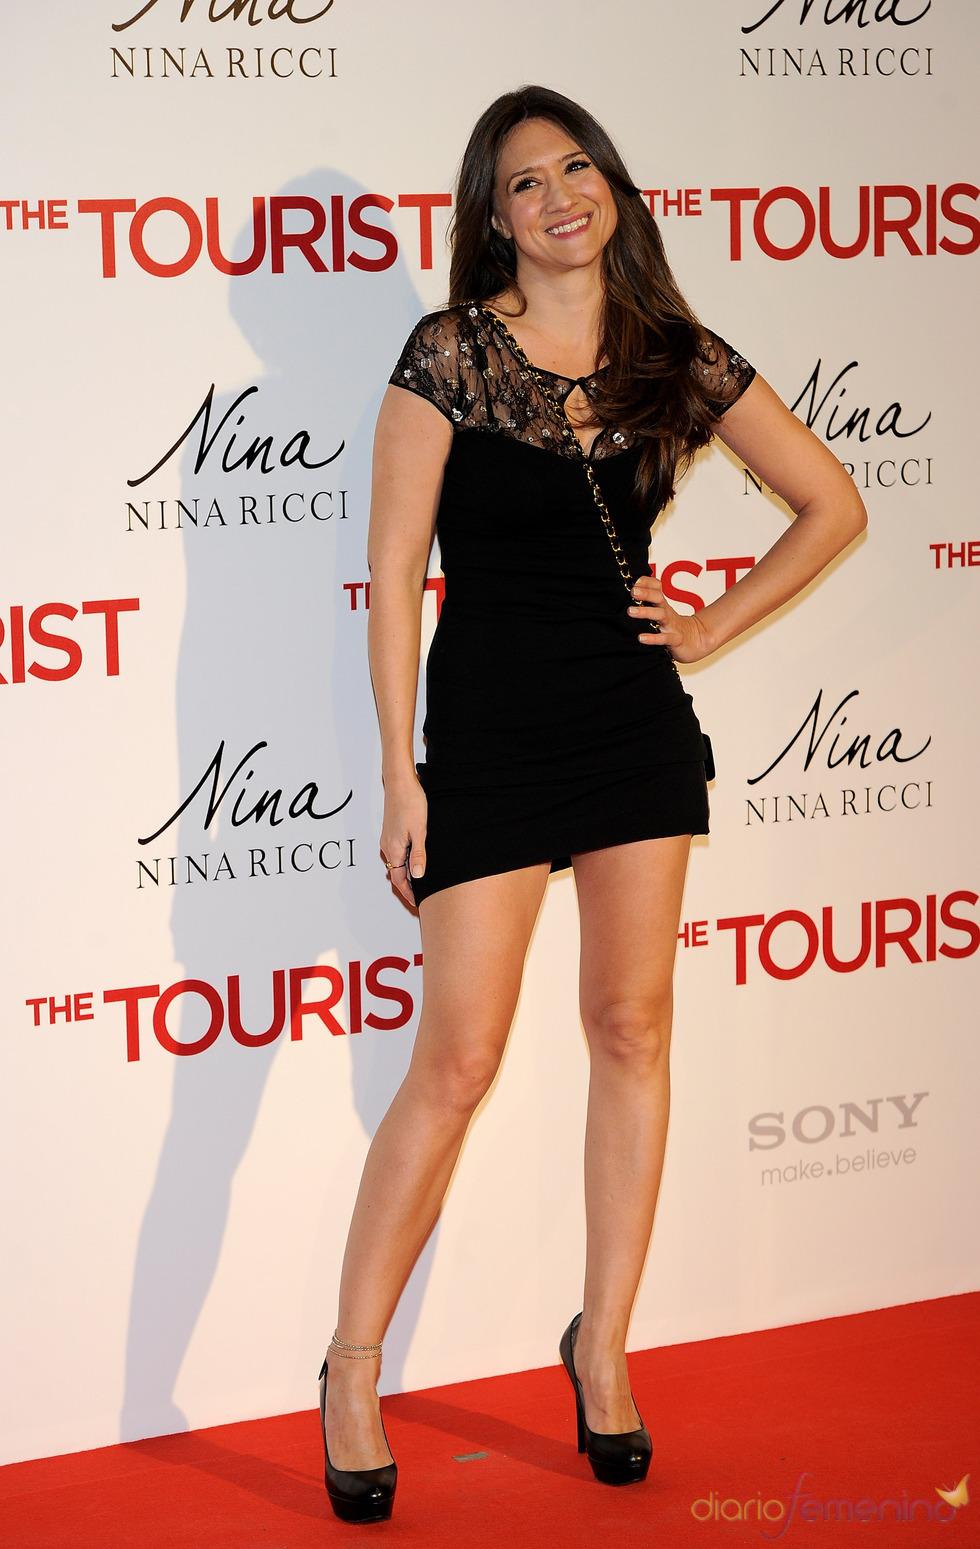 Maria Botto en la premiere en Madrid de 'The Tourist'